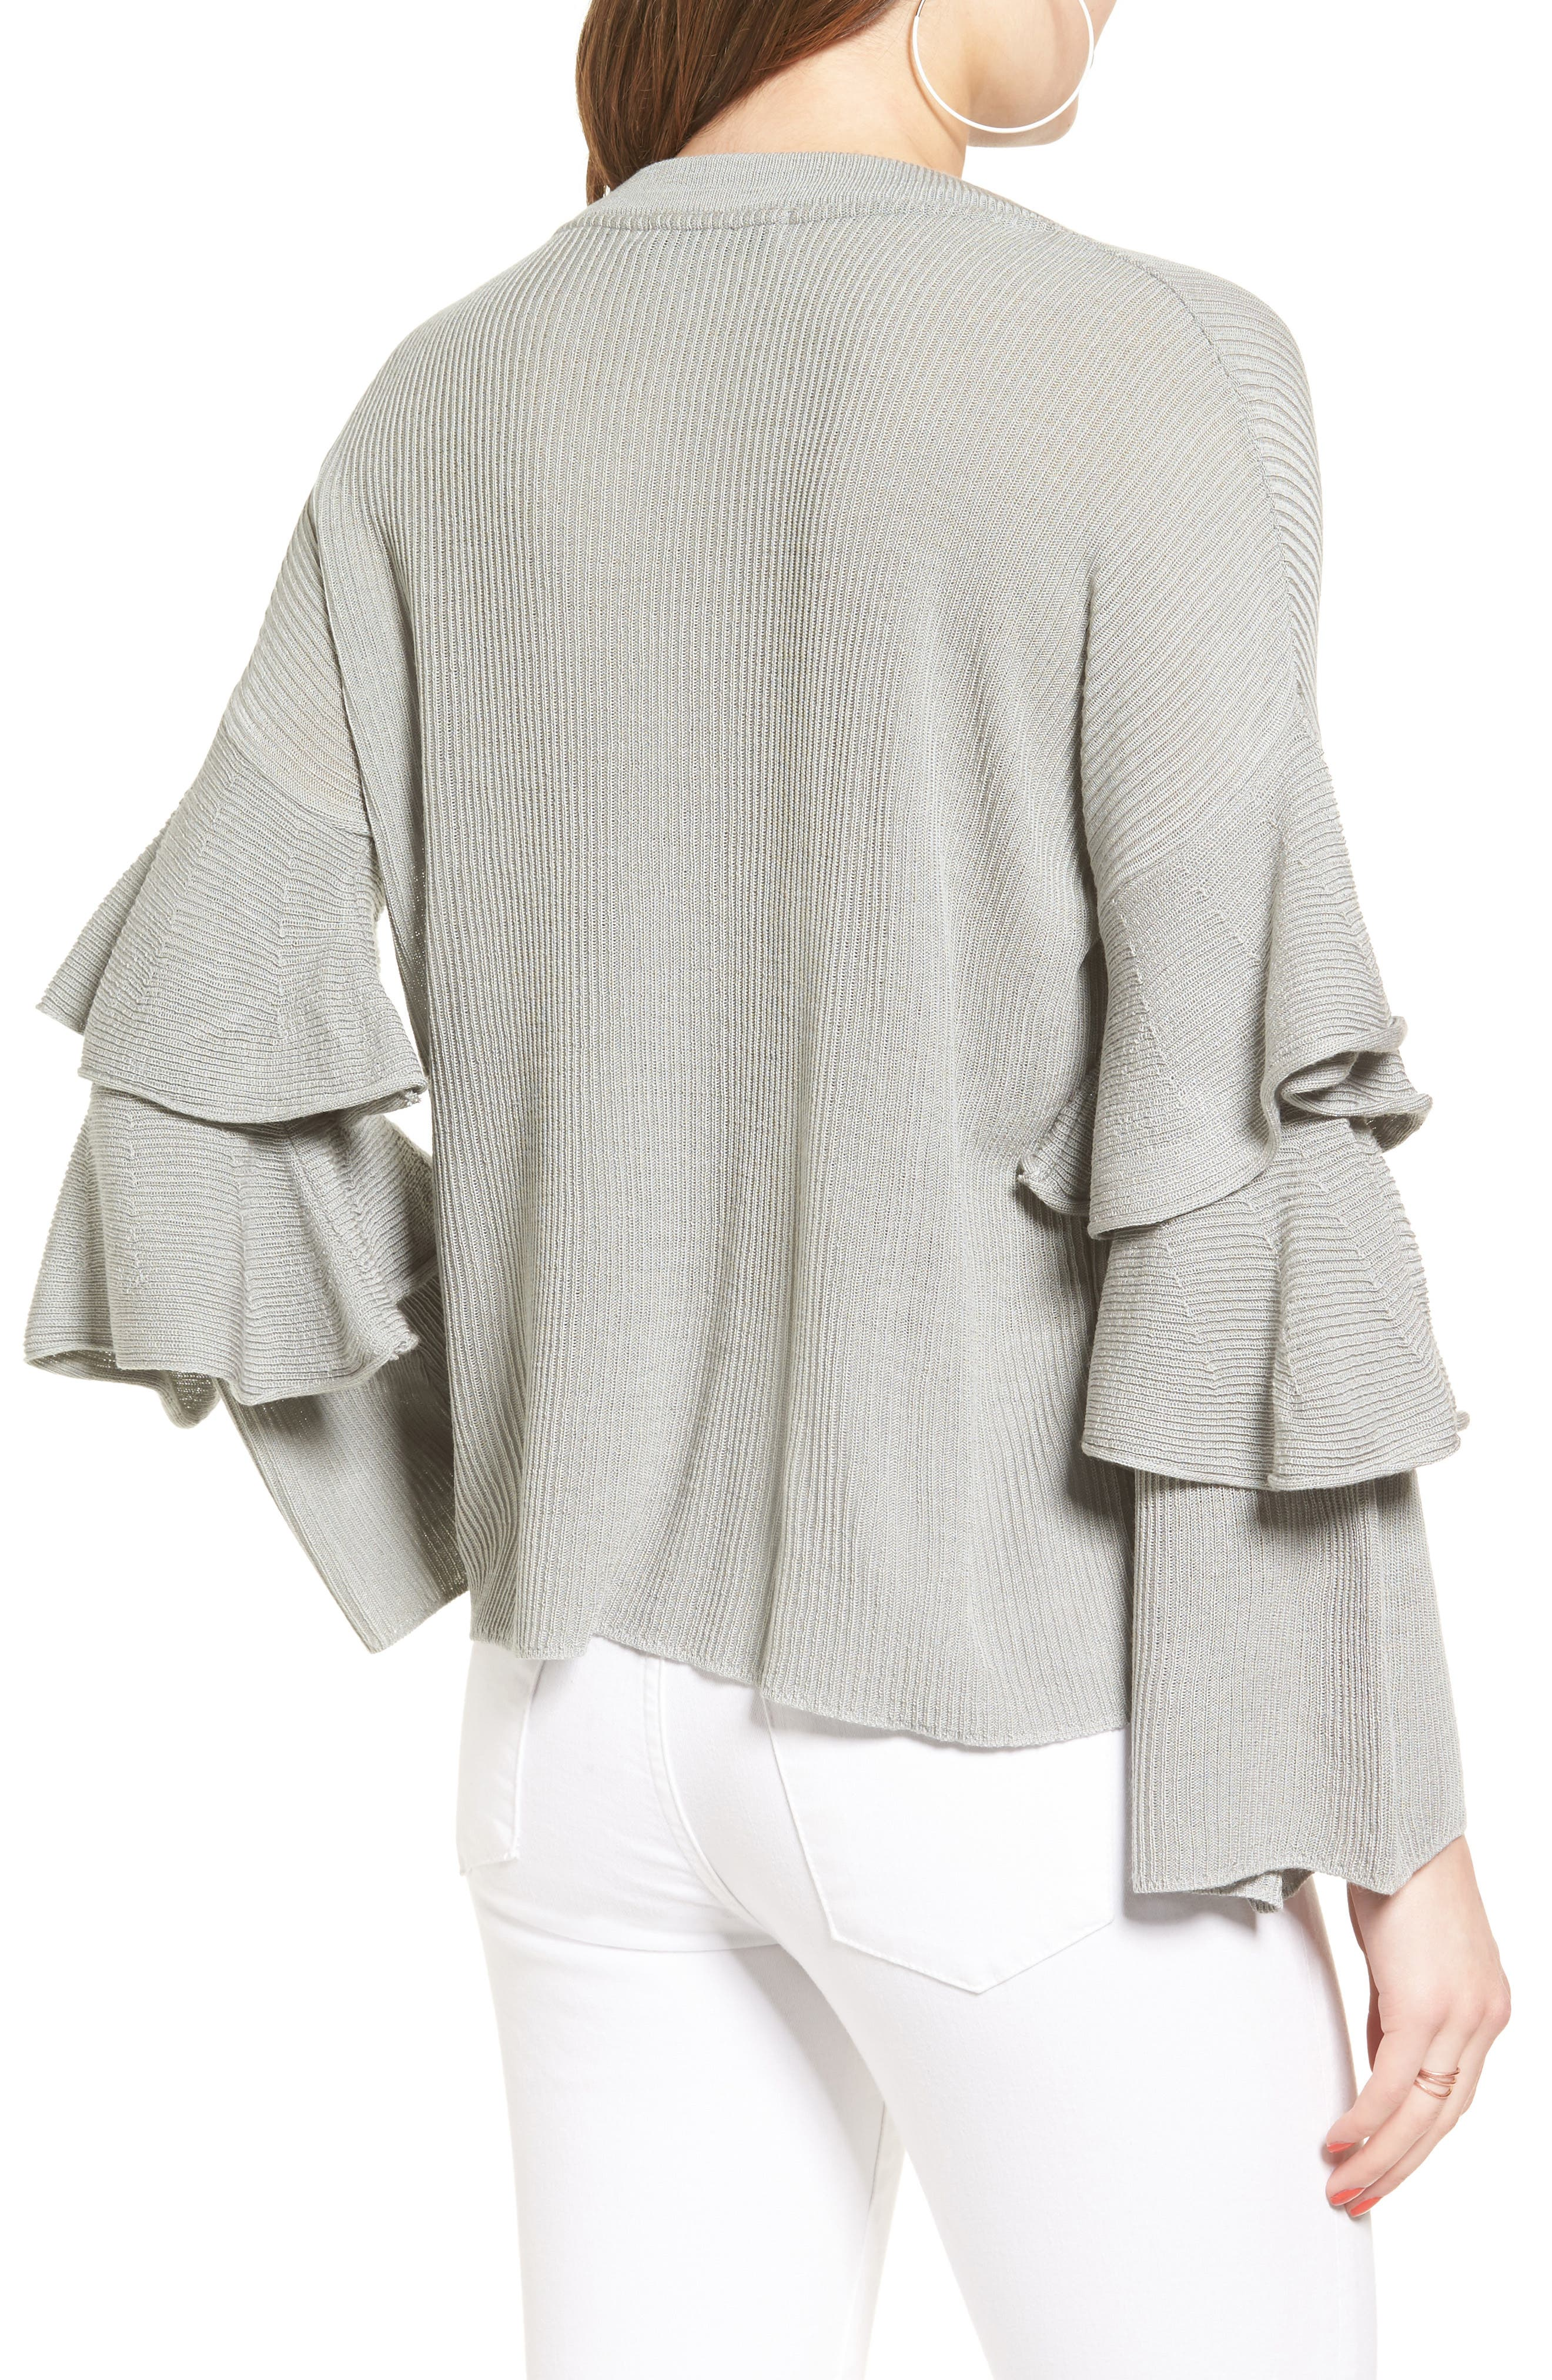 Ruffle Sleeve Sweater,                             Alternate thumbnail 2, color,                             034